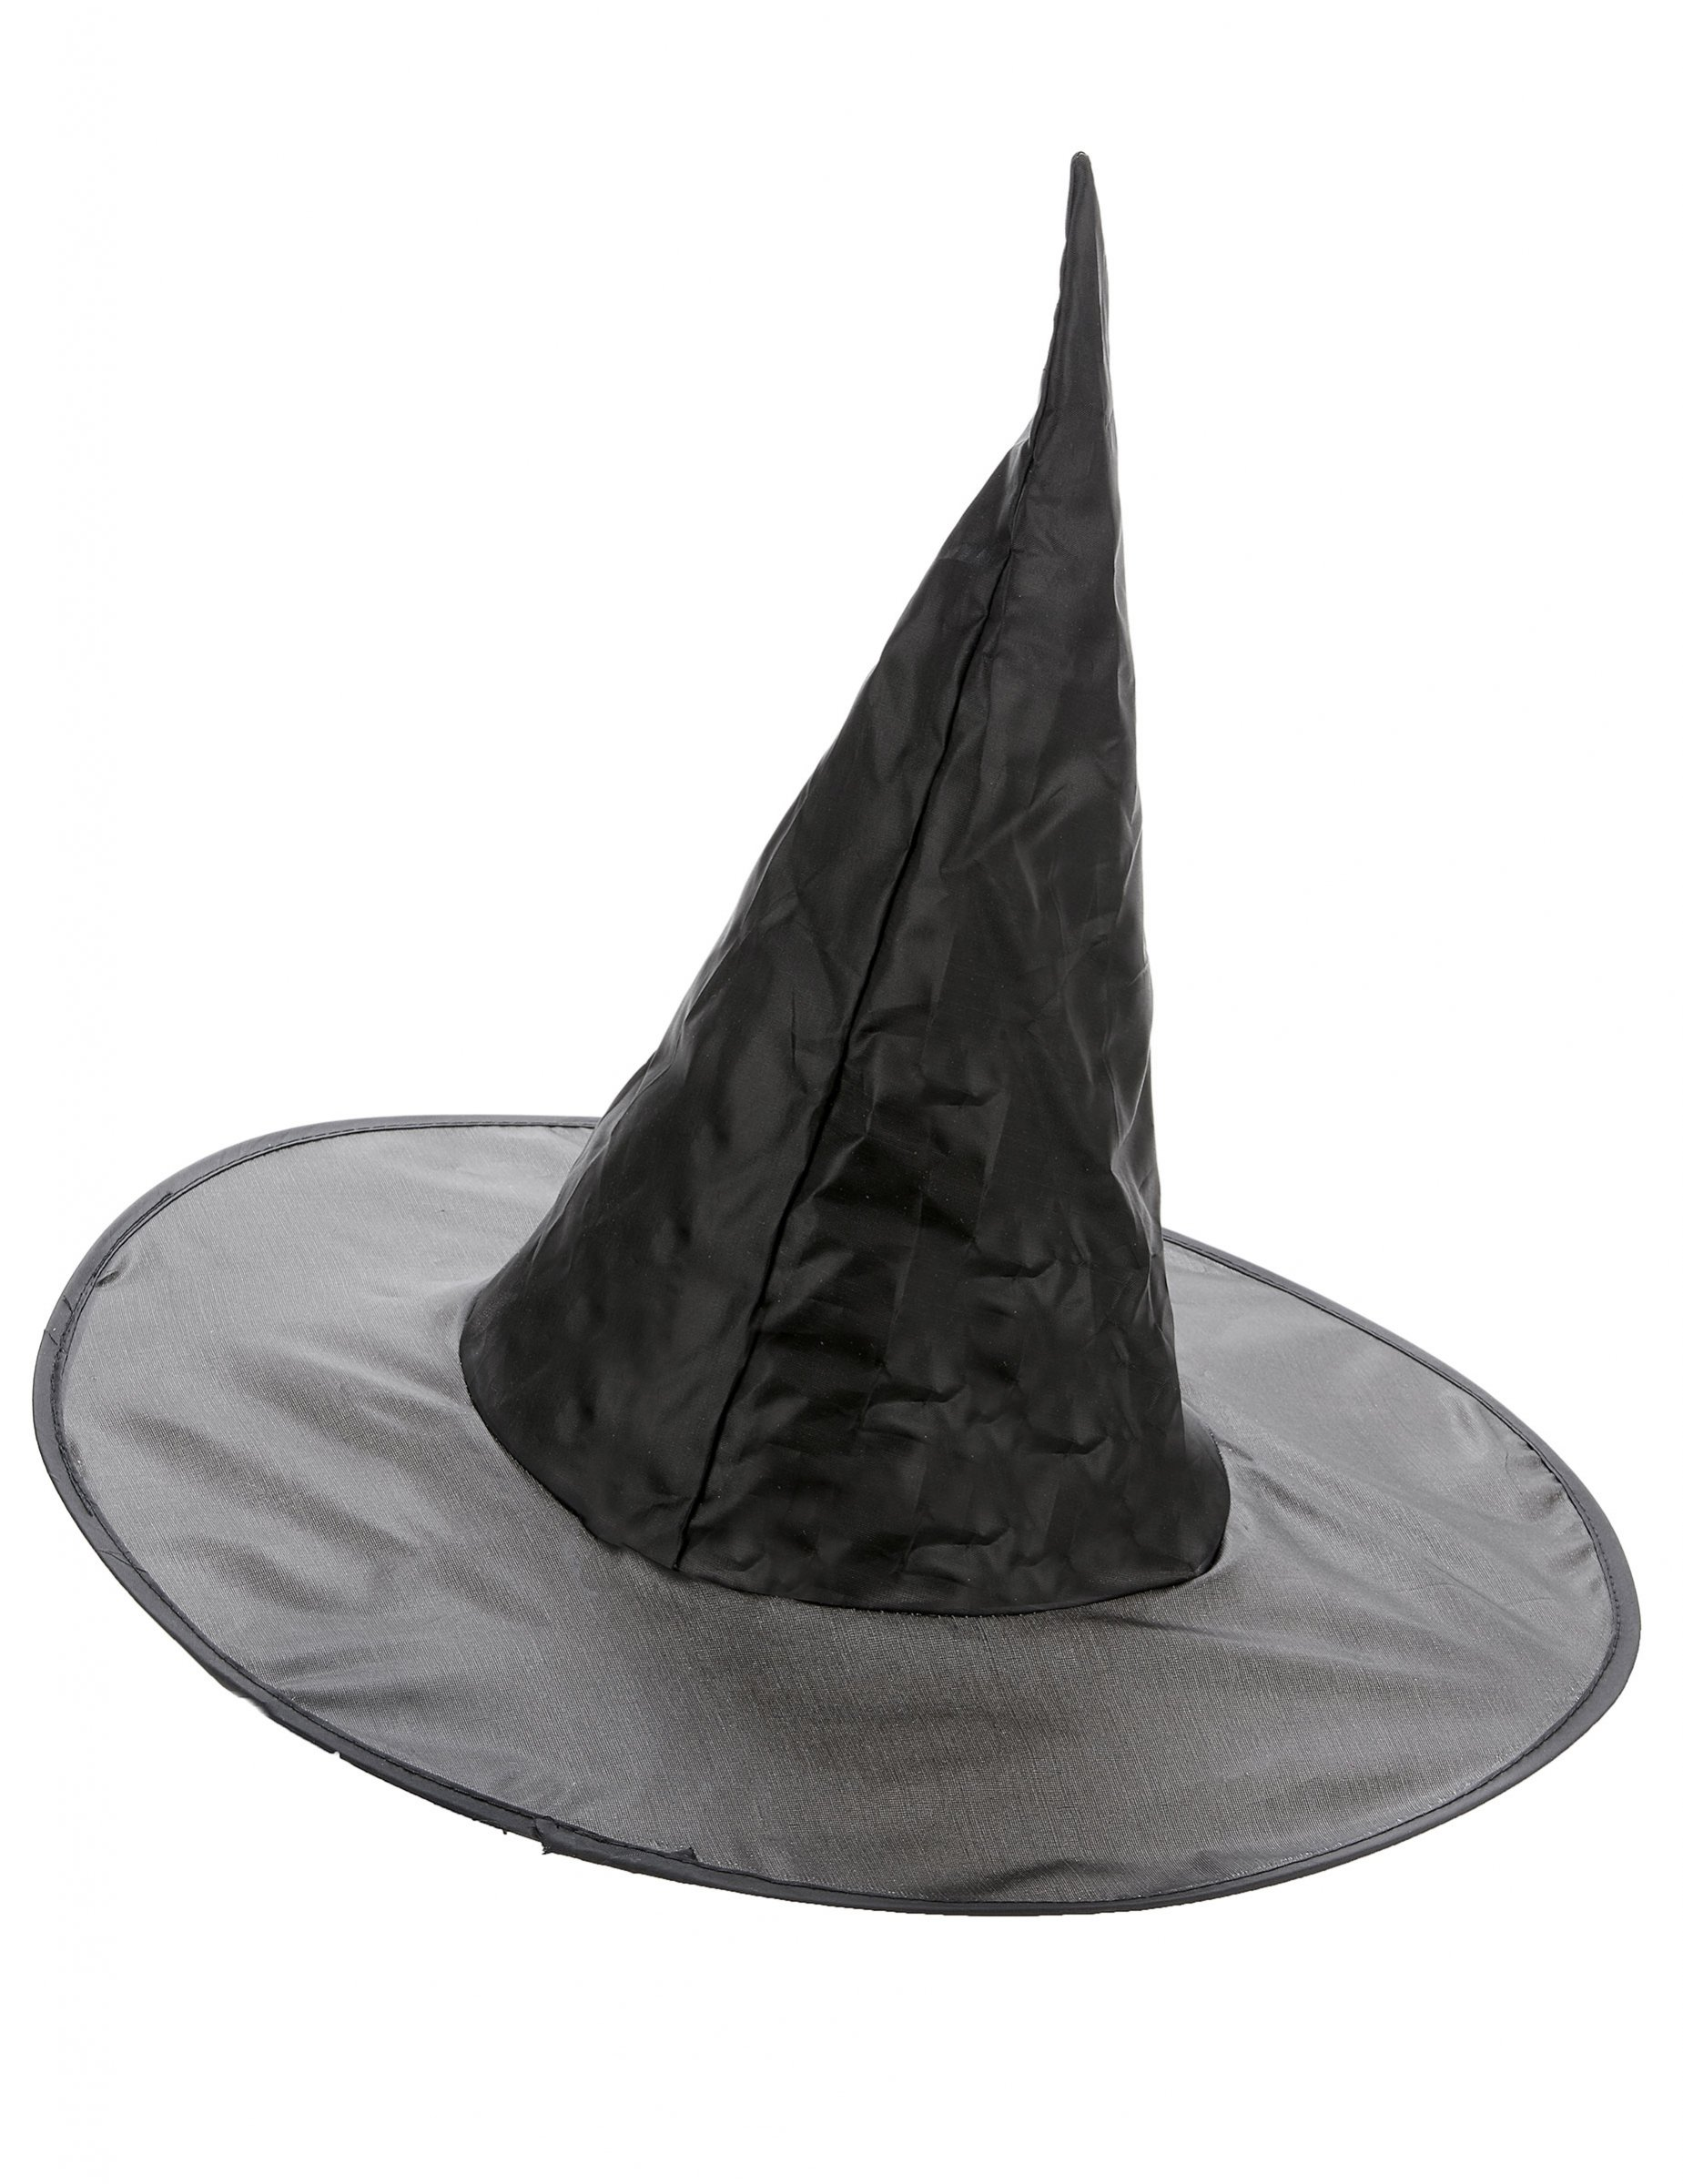 Cappello da strega nero leggero - Halloween  Cappelli 87d2c88d3a2a